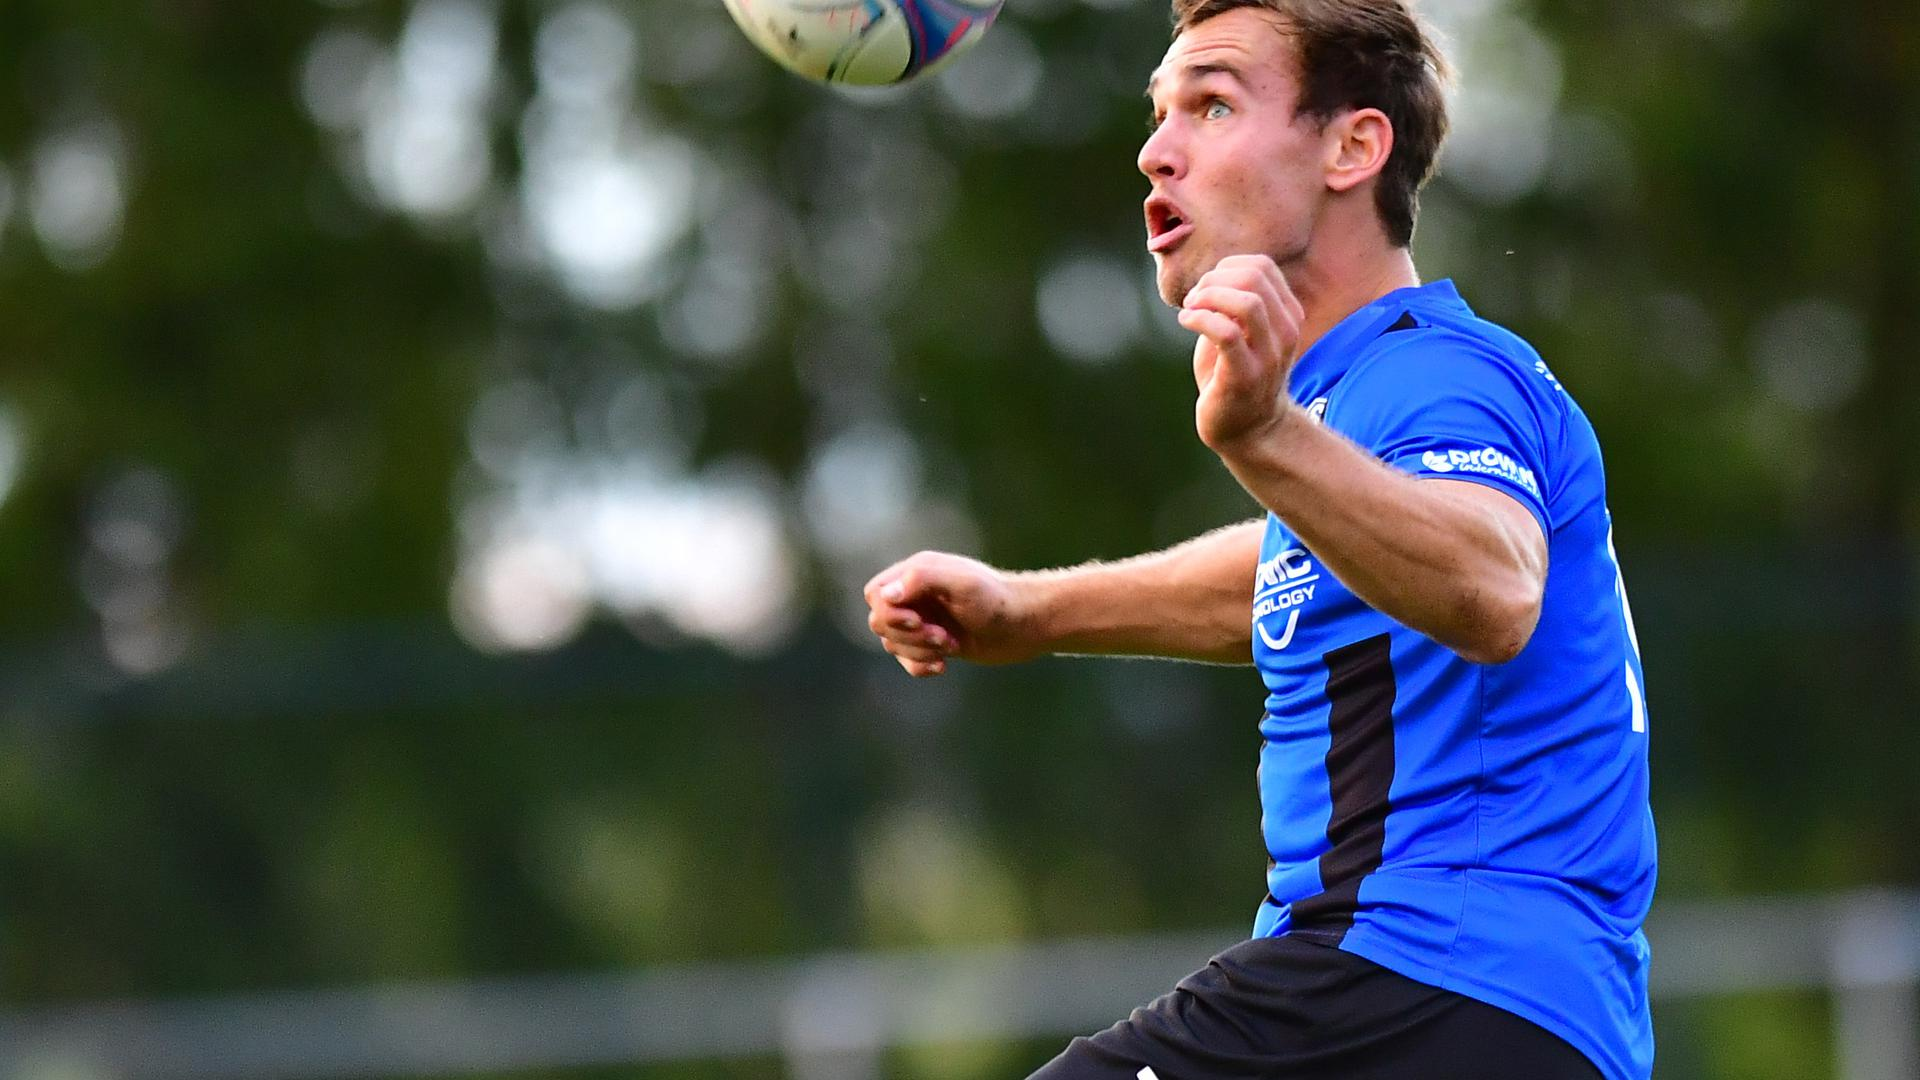 am Ball Dominic Riedel (Langensteinbach)   GES/ Fussball/ Landesliga, SV Langensteinbach -ATSV Mutschelbach 2,  13.09.2019